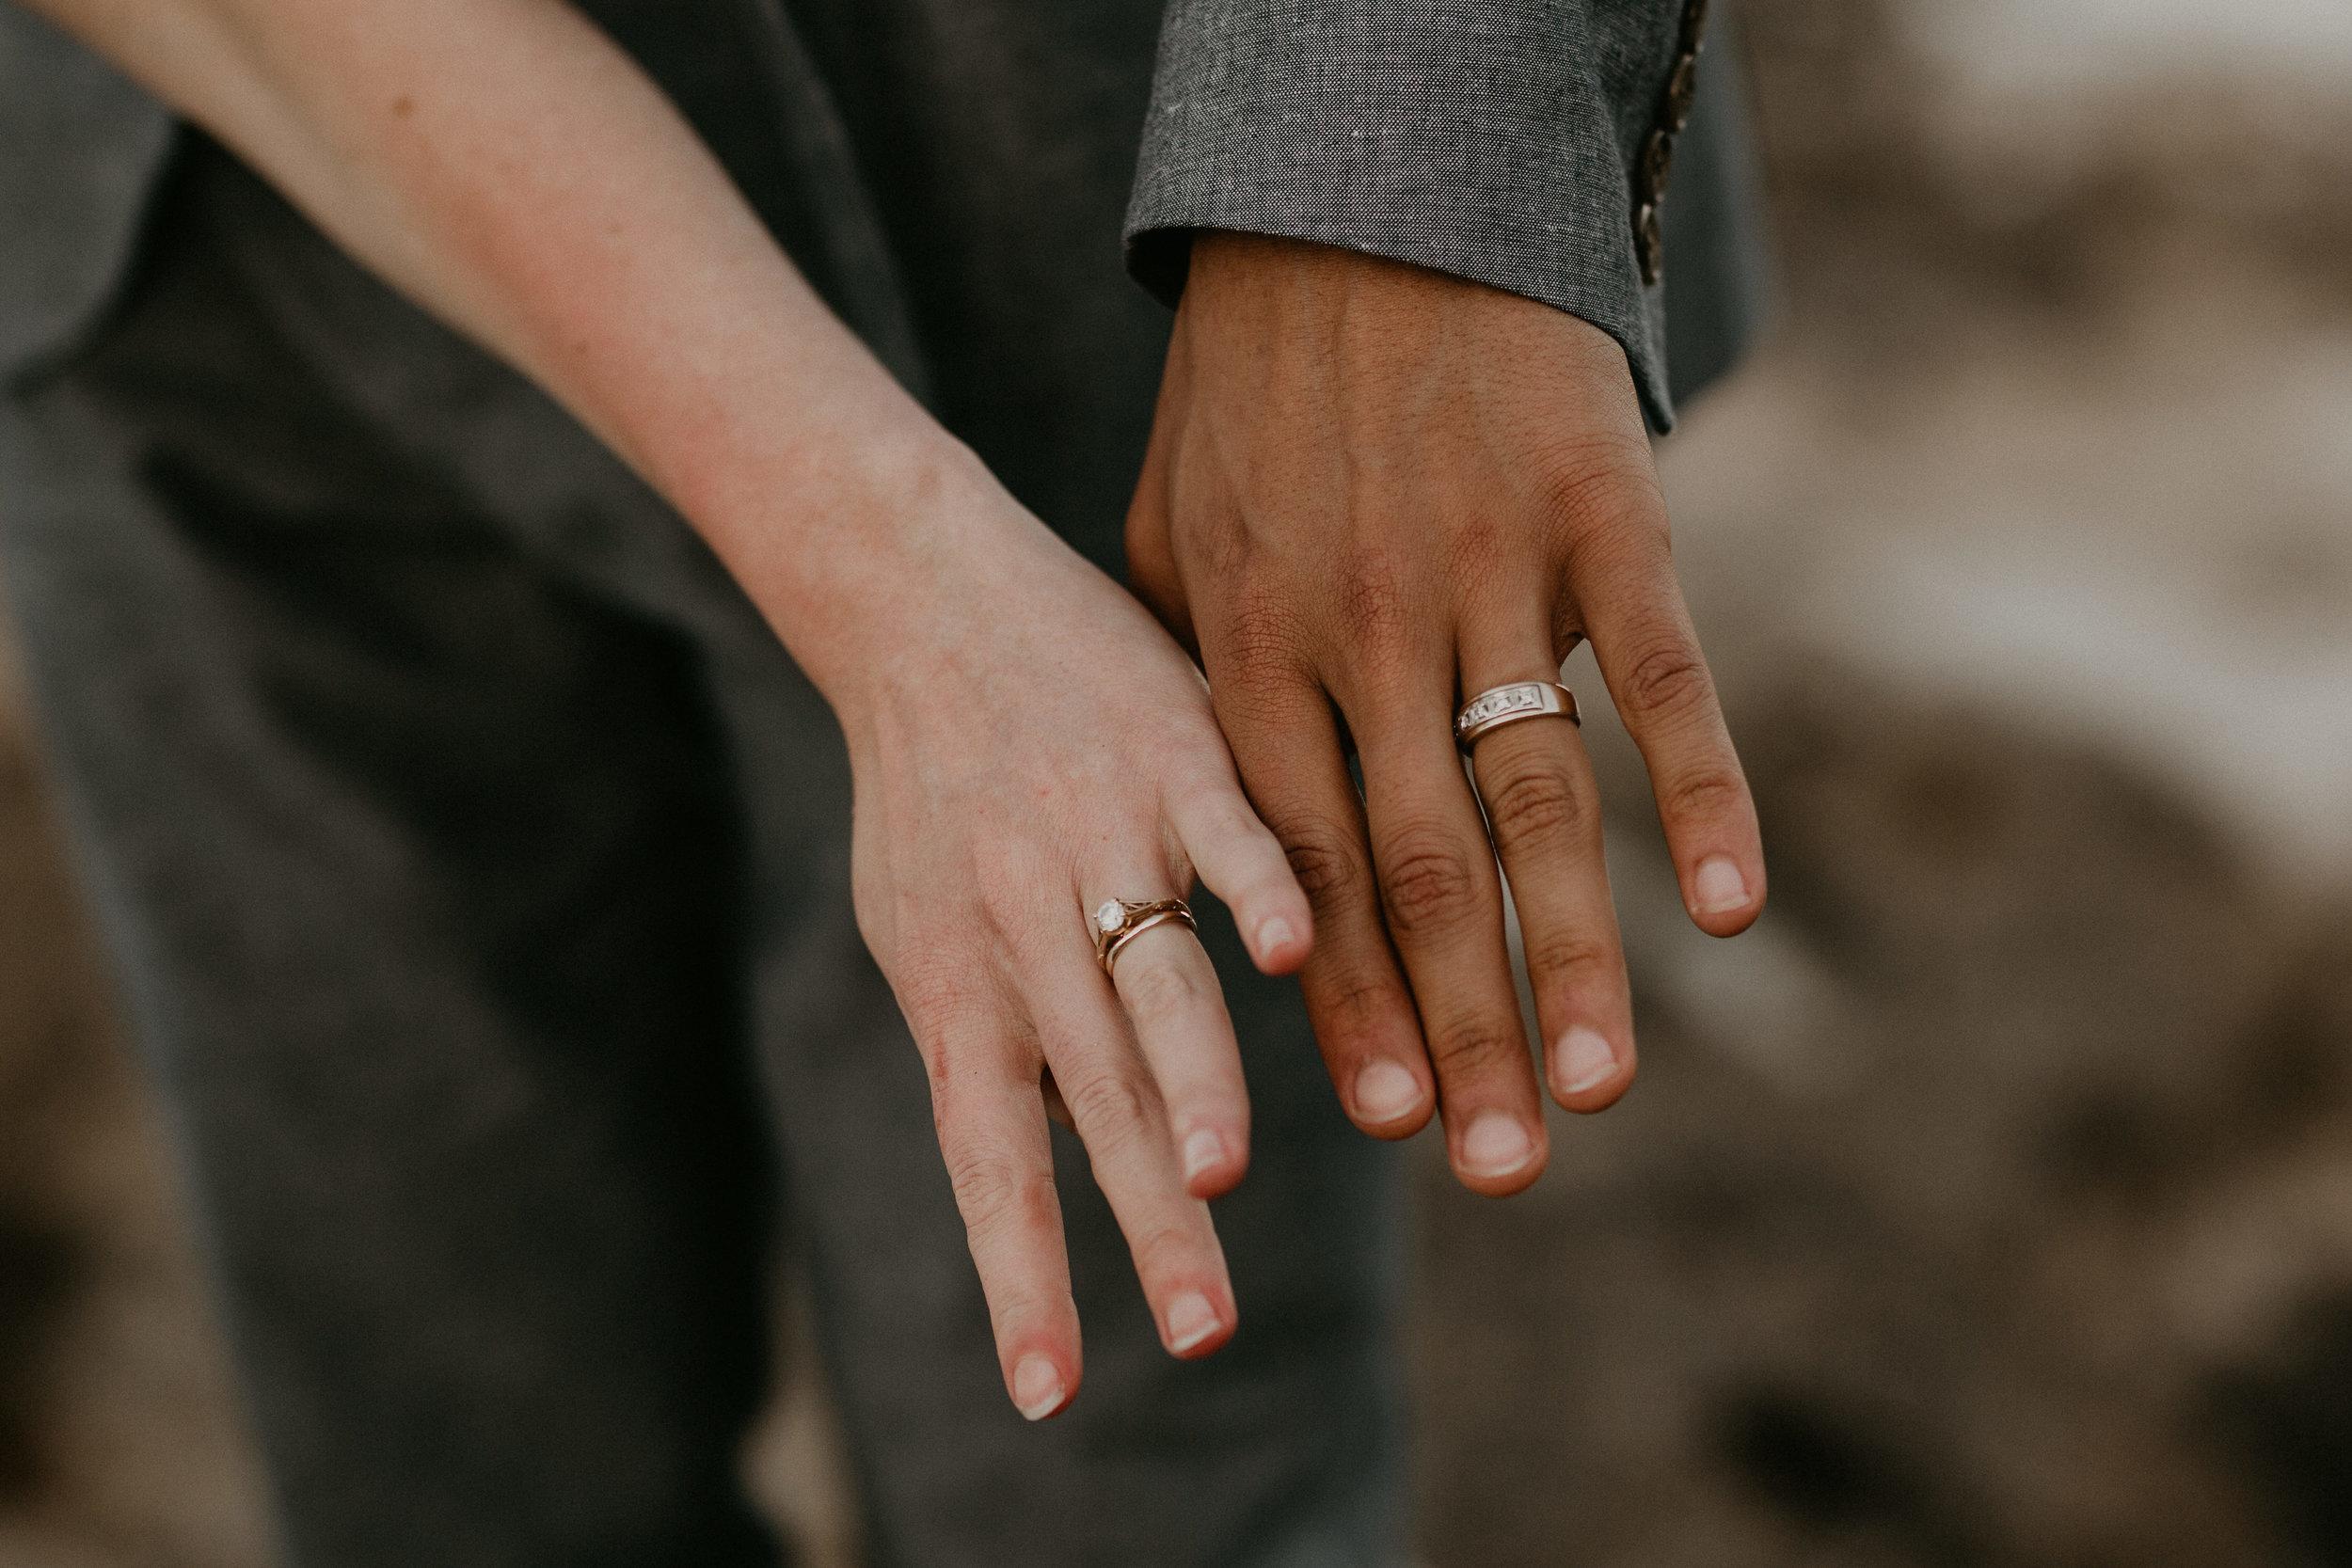 Nicole-Daacke-Photography-beachfront-akumal-destionation-wedding-tulum-mexico-elopement-photographer-destination-wedding-inspiration-sunset-champagne-pop-boho-bride-ocean-tropical-bohemian-tulum-wedding-photos-193.jpg